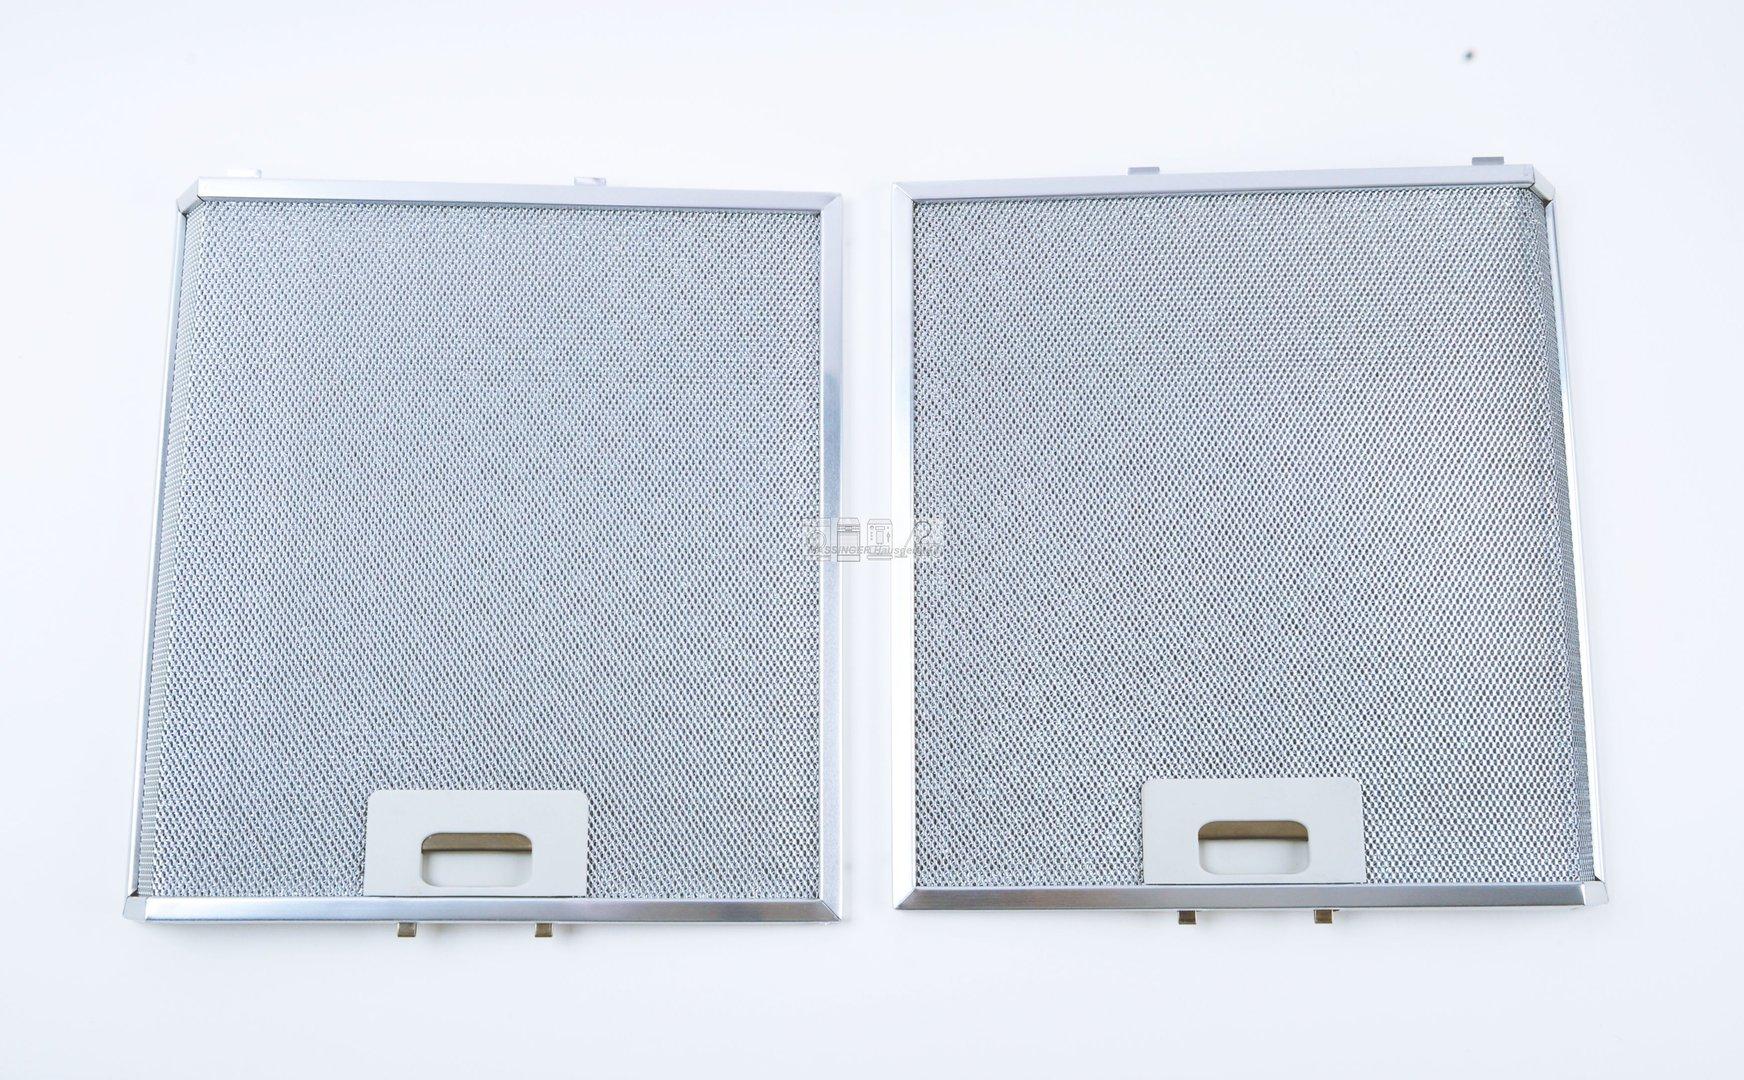 aeg juno zanker 2 x metall fettfilter dunstabzugshaube 5029982500. Black Bedroom Furniture Sets. Home Design Ideas